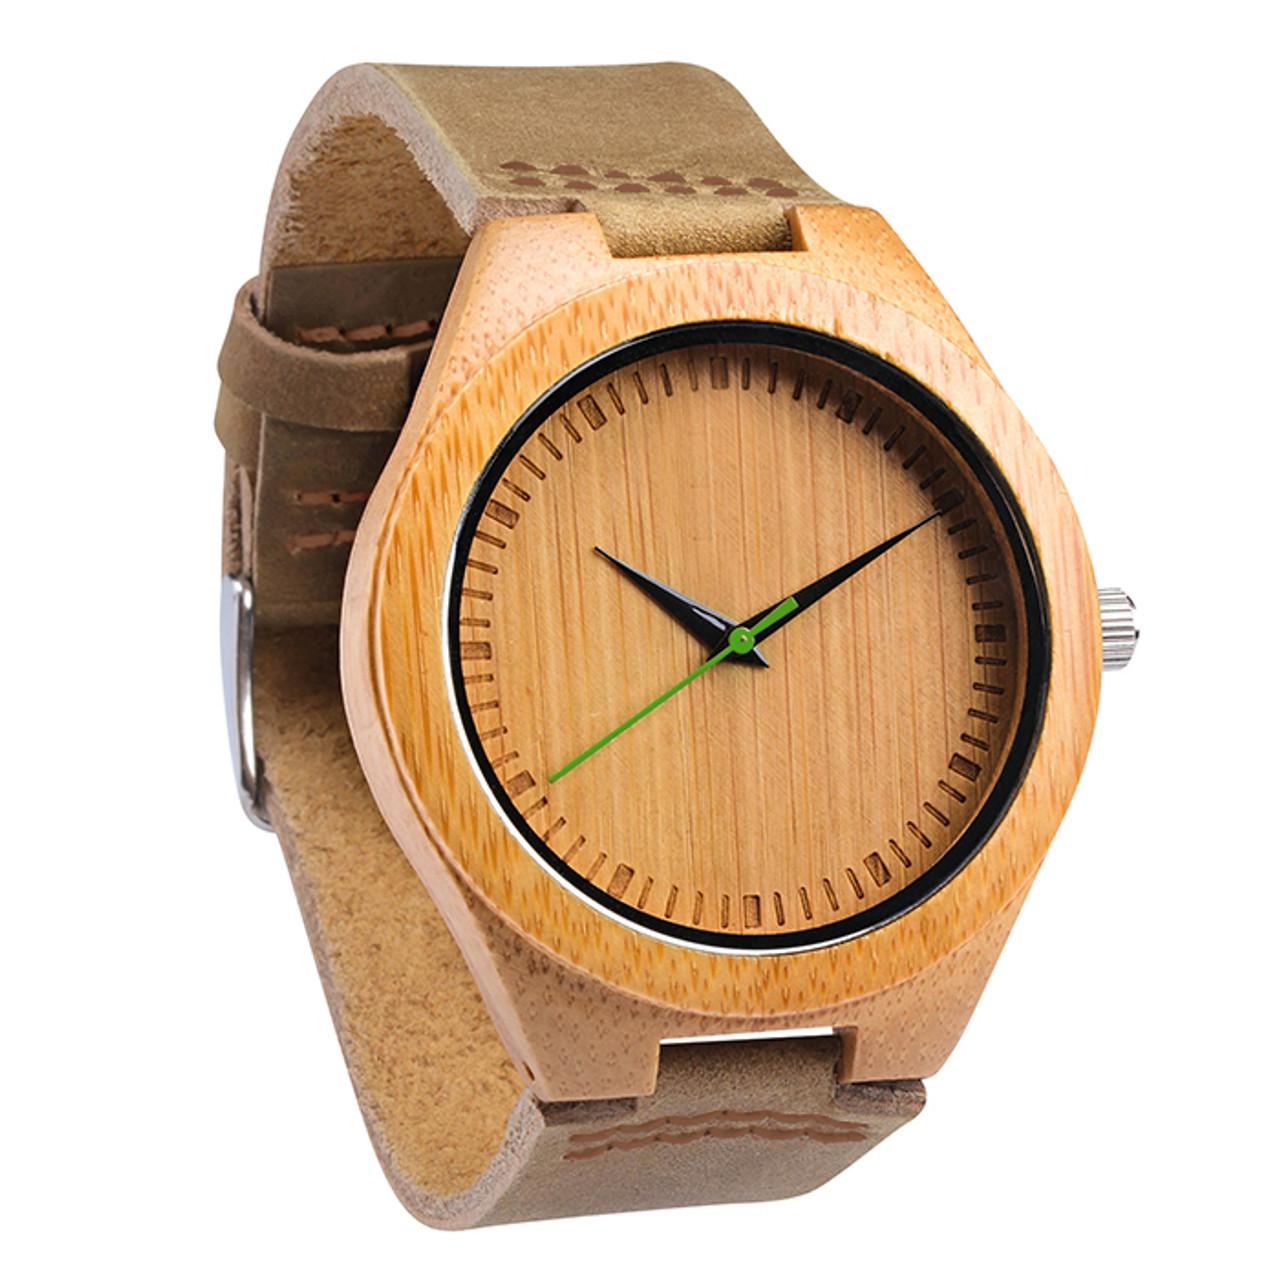 Grpn -Wood Engraved Watch W#63 - Verdent